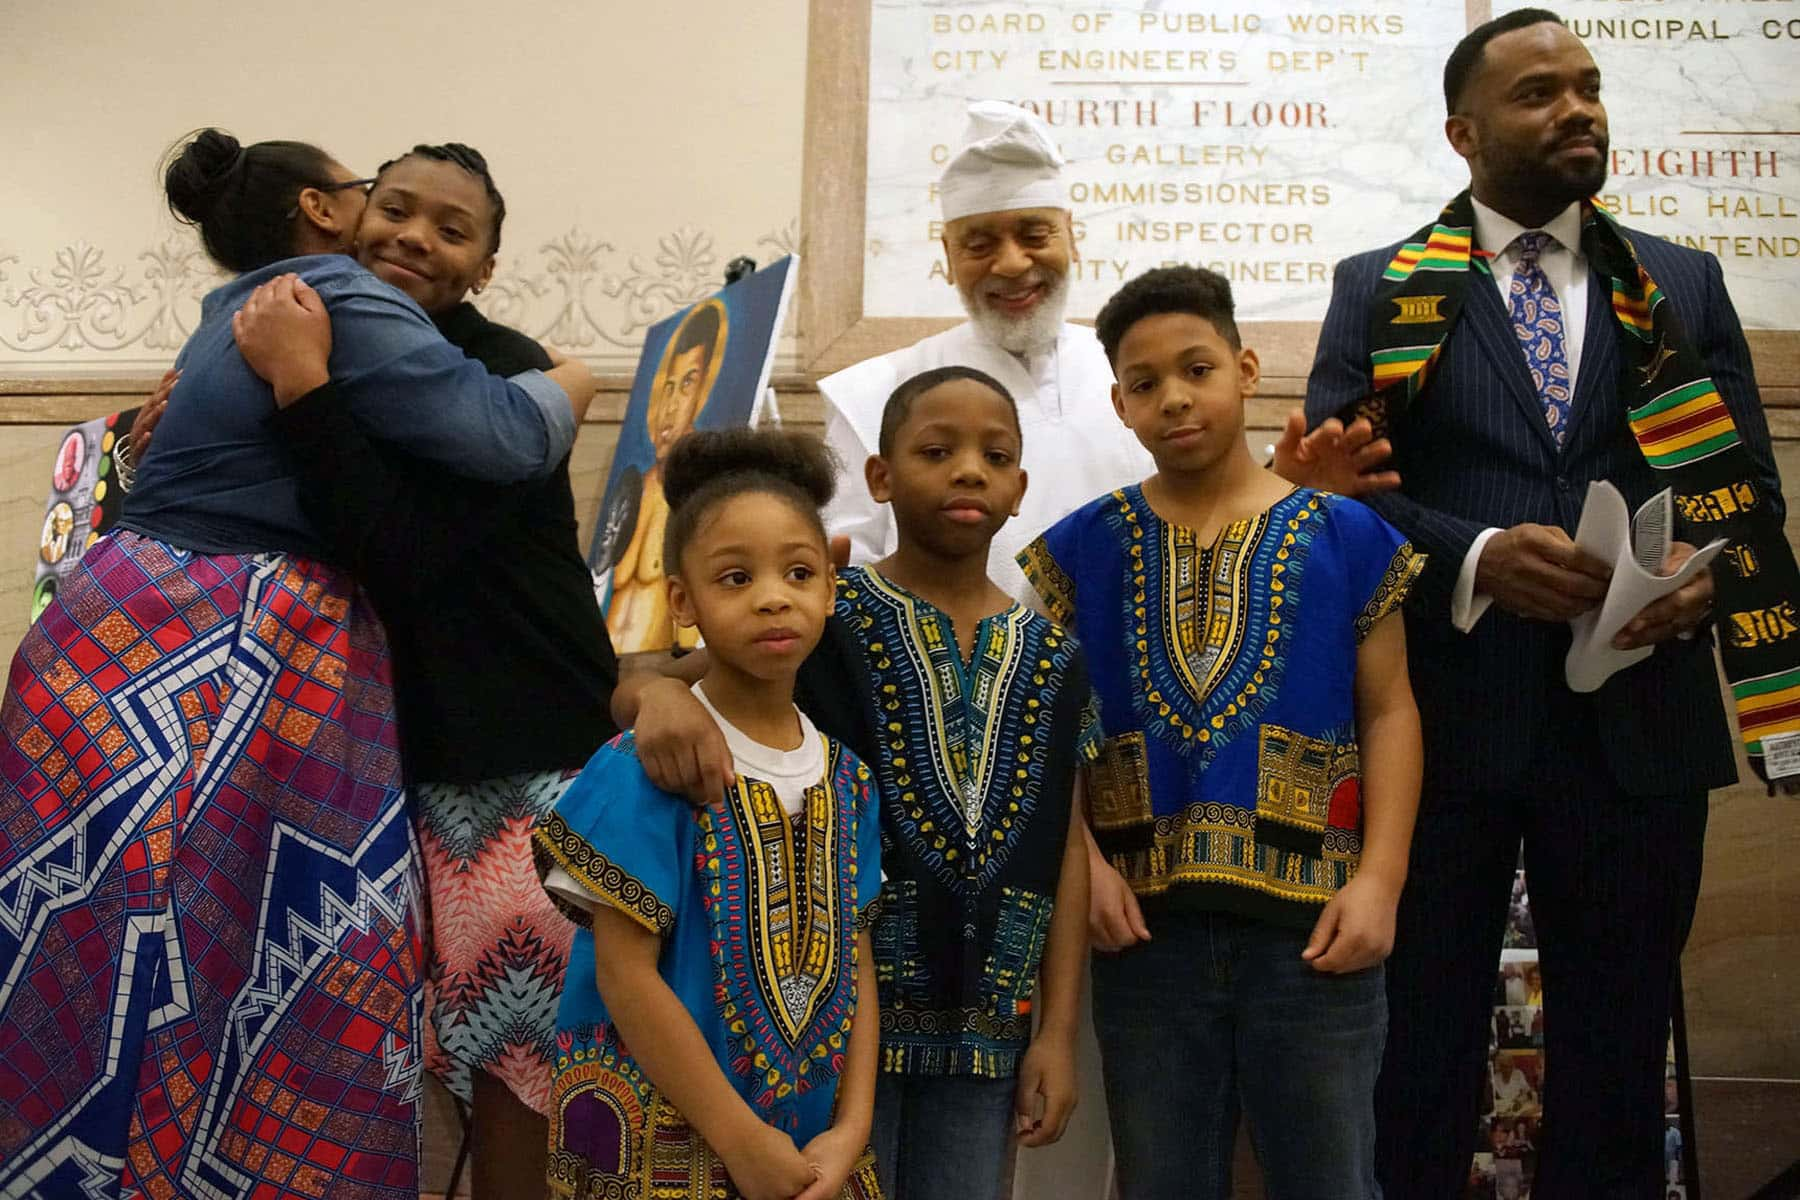 photo essay city hall hosts inaugural black history program the photo essay city hall hosts inaugural black history program